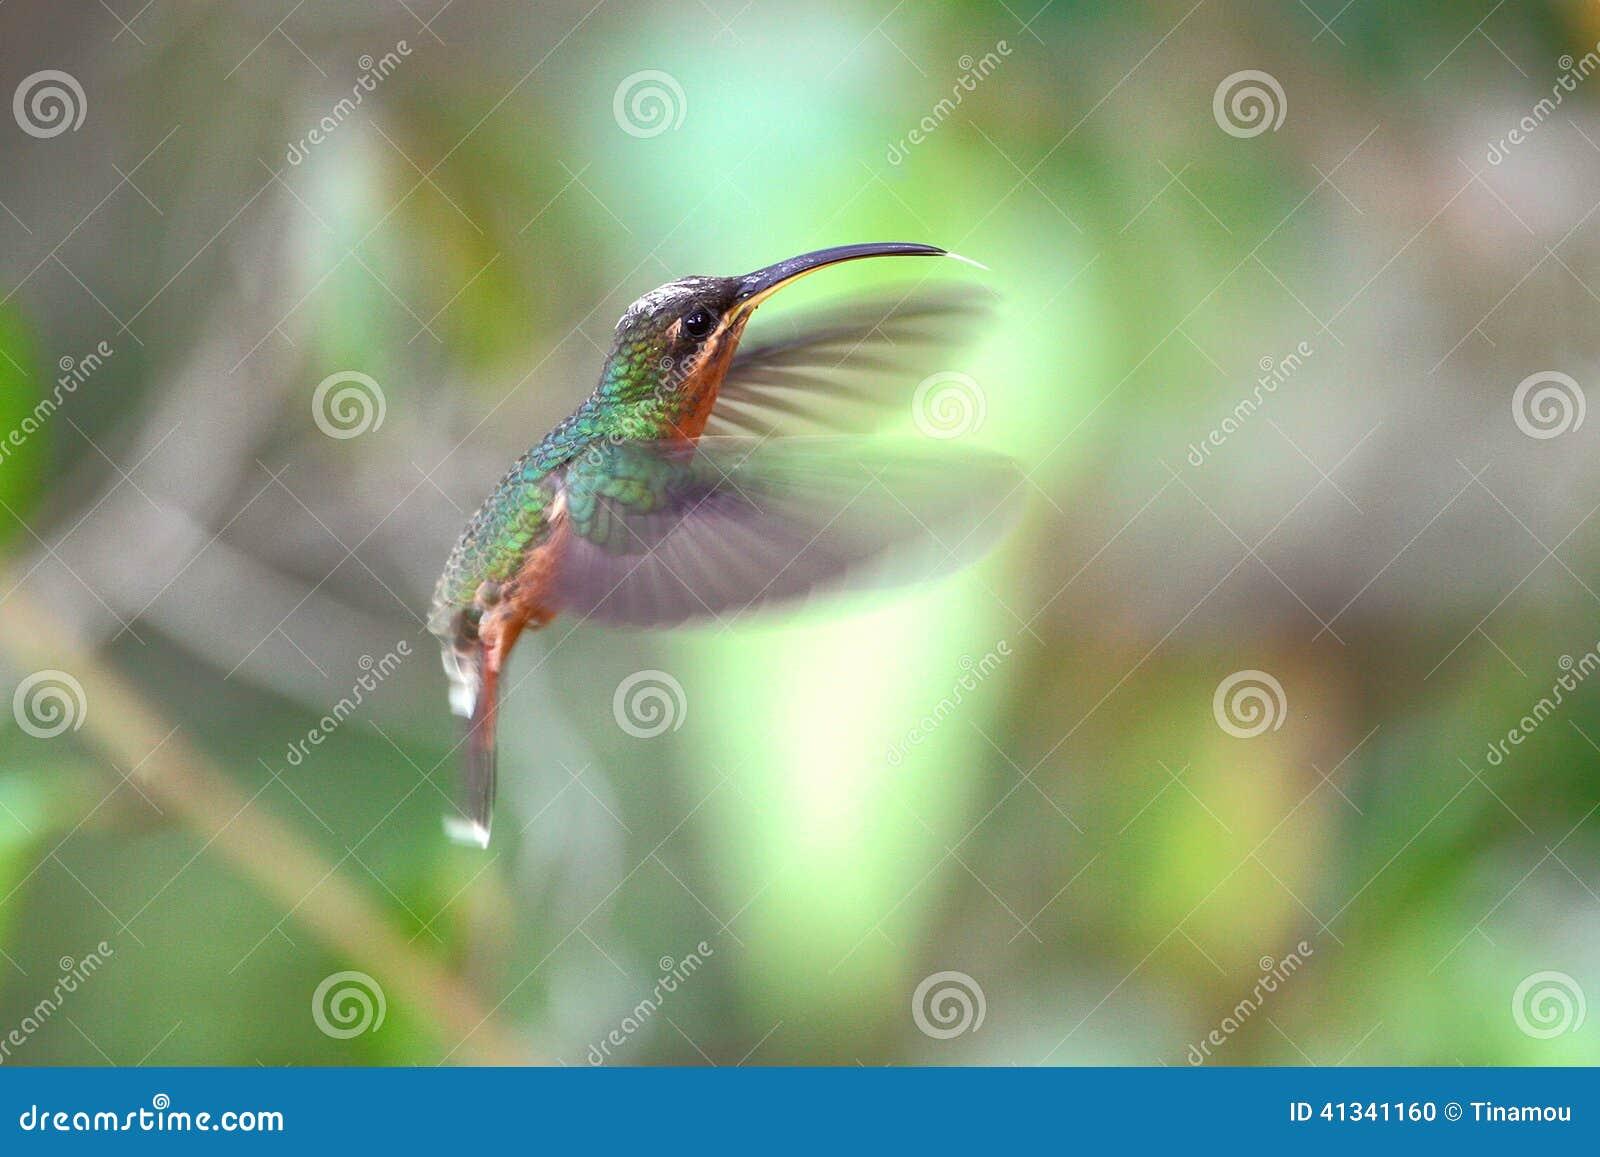 Rufous-breasted hermit, hummingbird in Peru